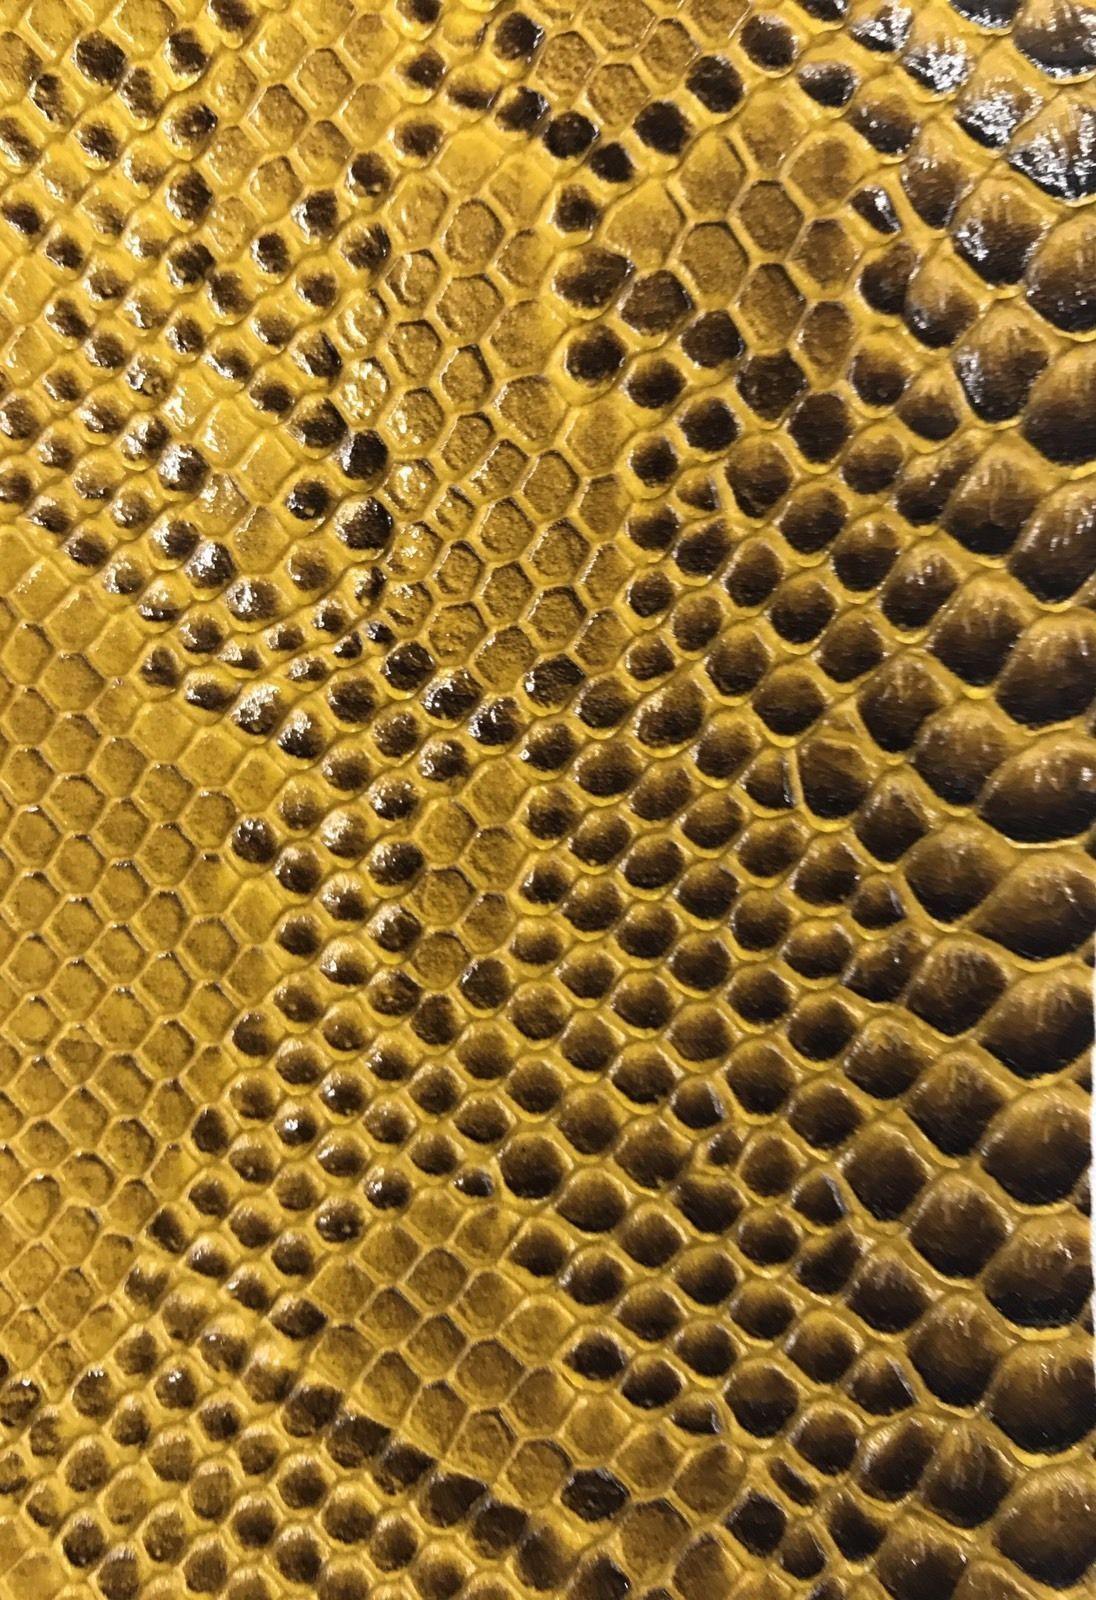 Vinyl Fabric Gold Faux Viper Snake Skin Leather Upholstery 3d Scales By The Yard Viper Snake Snake Wallpaper Snake Skin